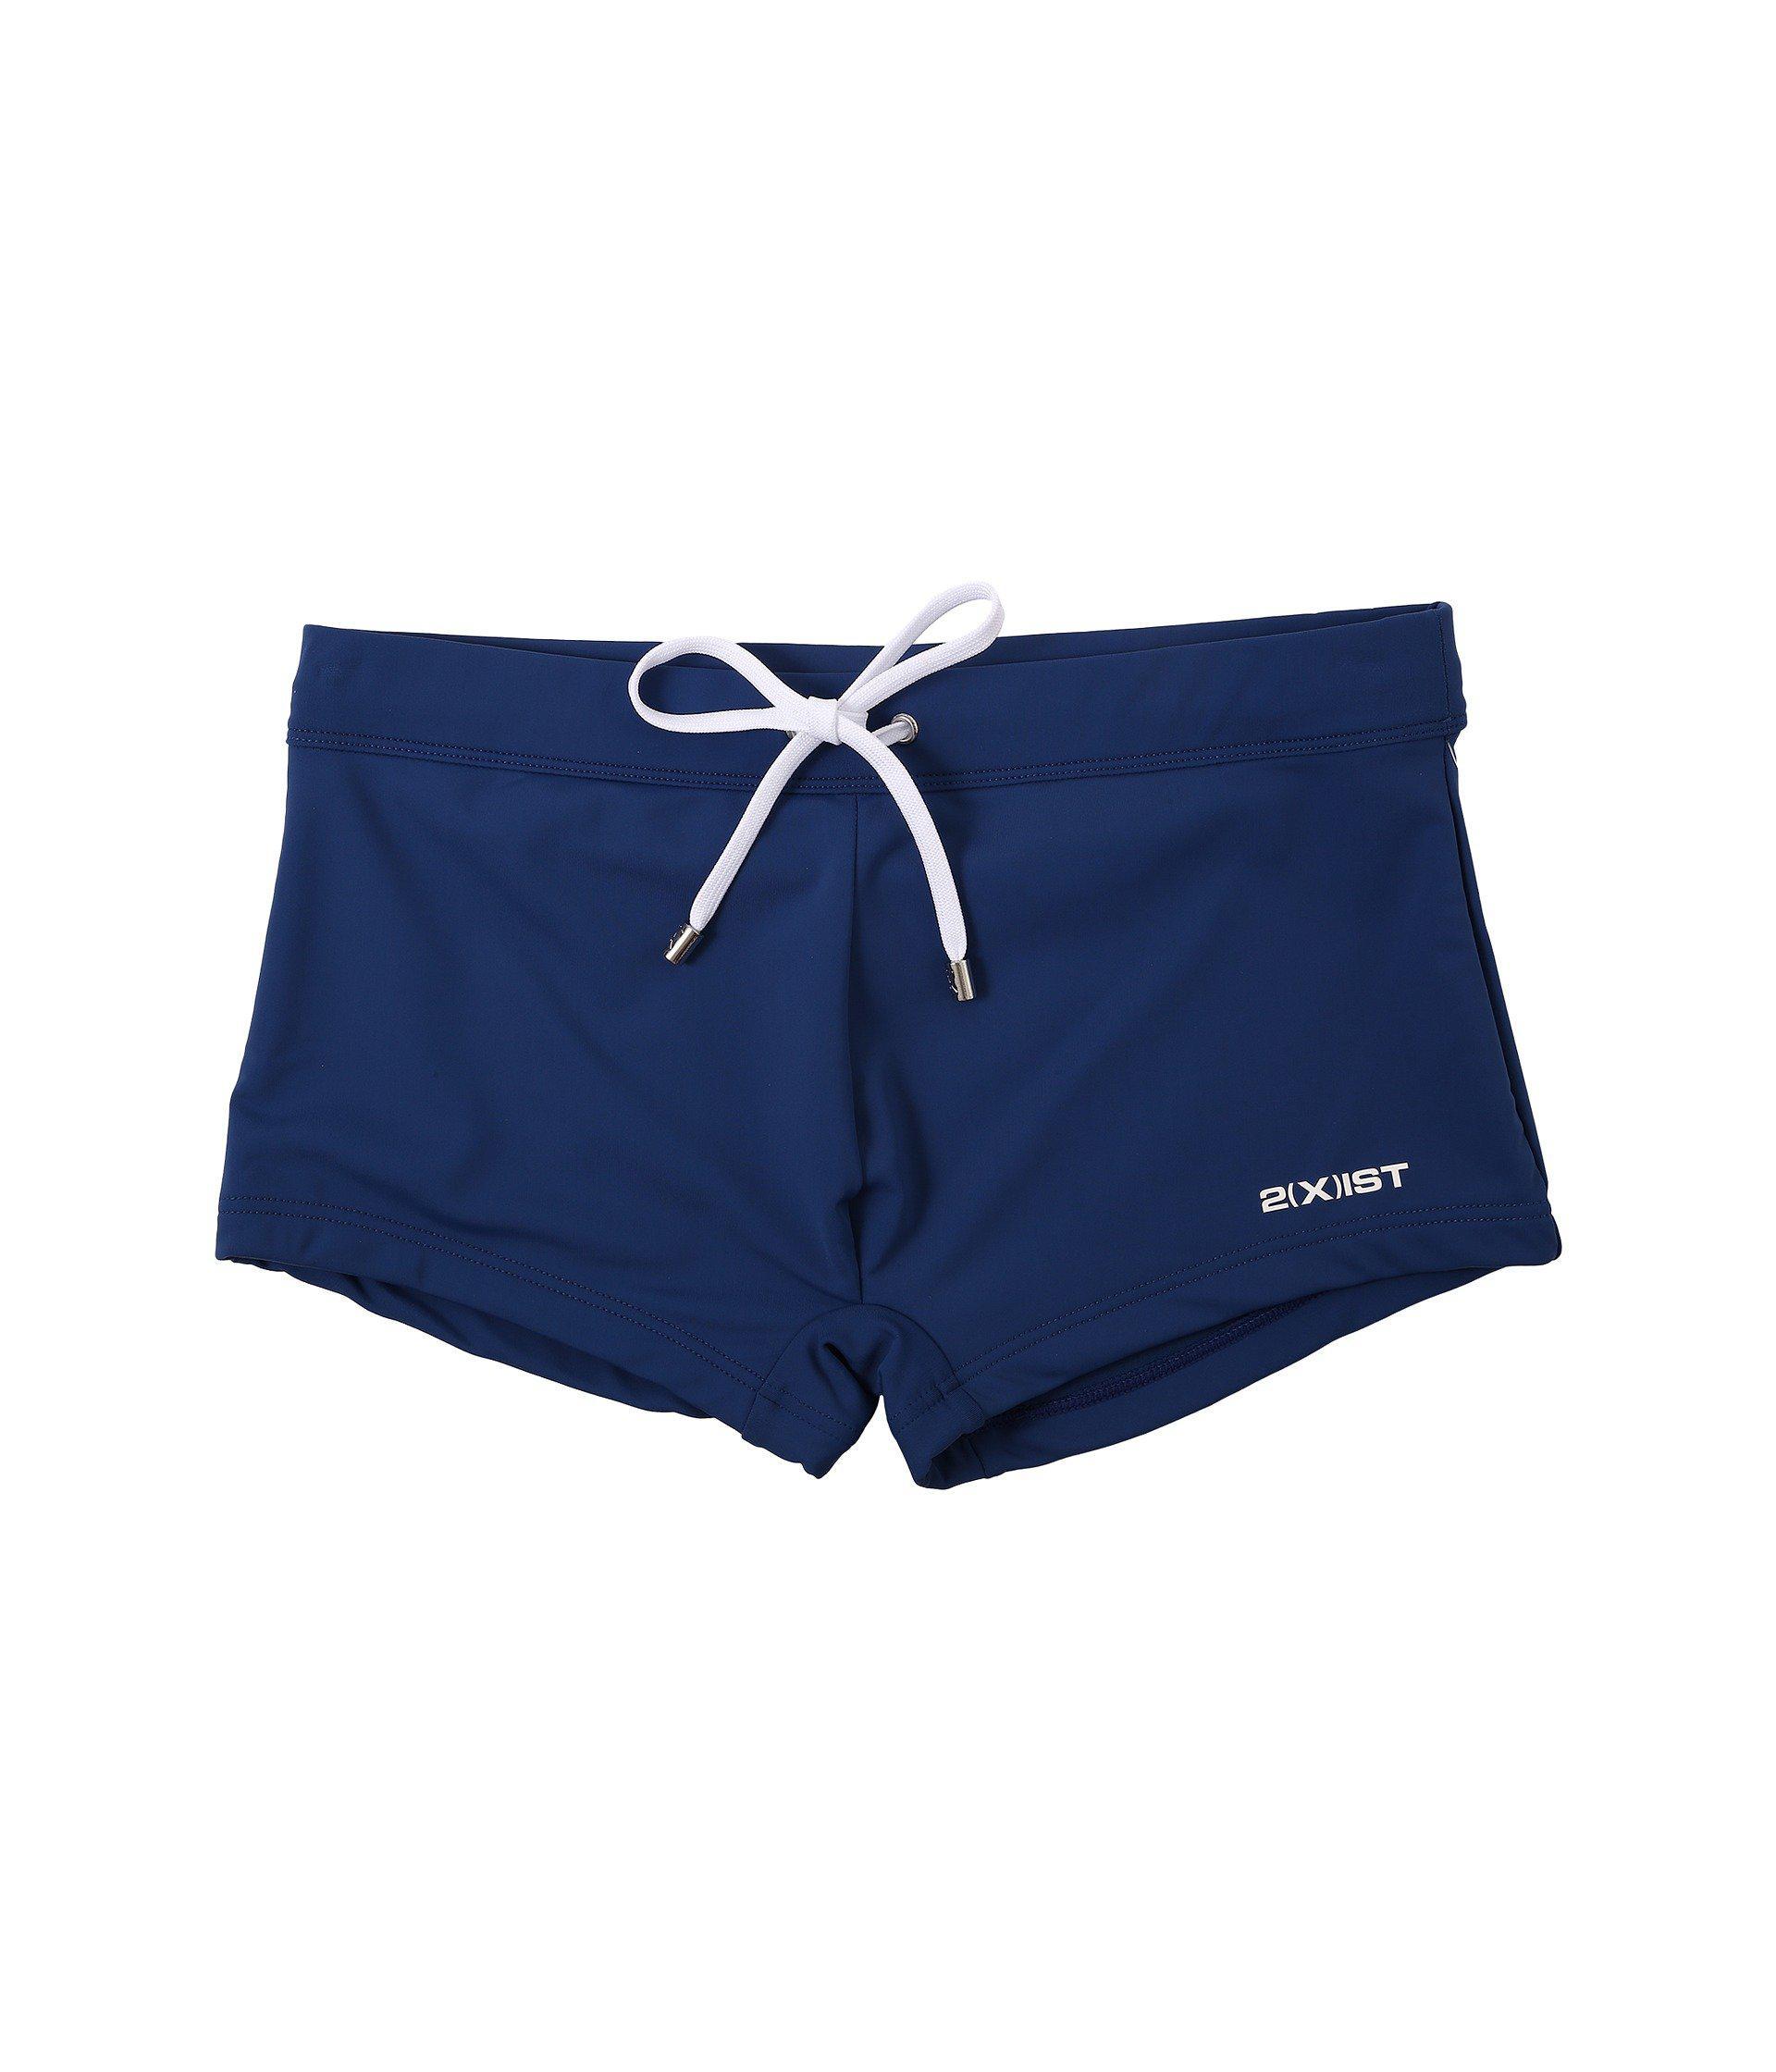 74edd268e4 Lyst - 2xist 2(x)ist Essential Cabo (black) Men's Swimwear in Blue ...